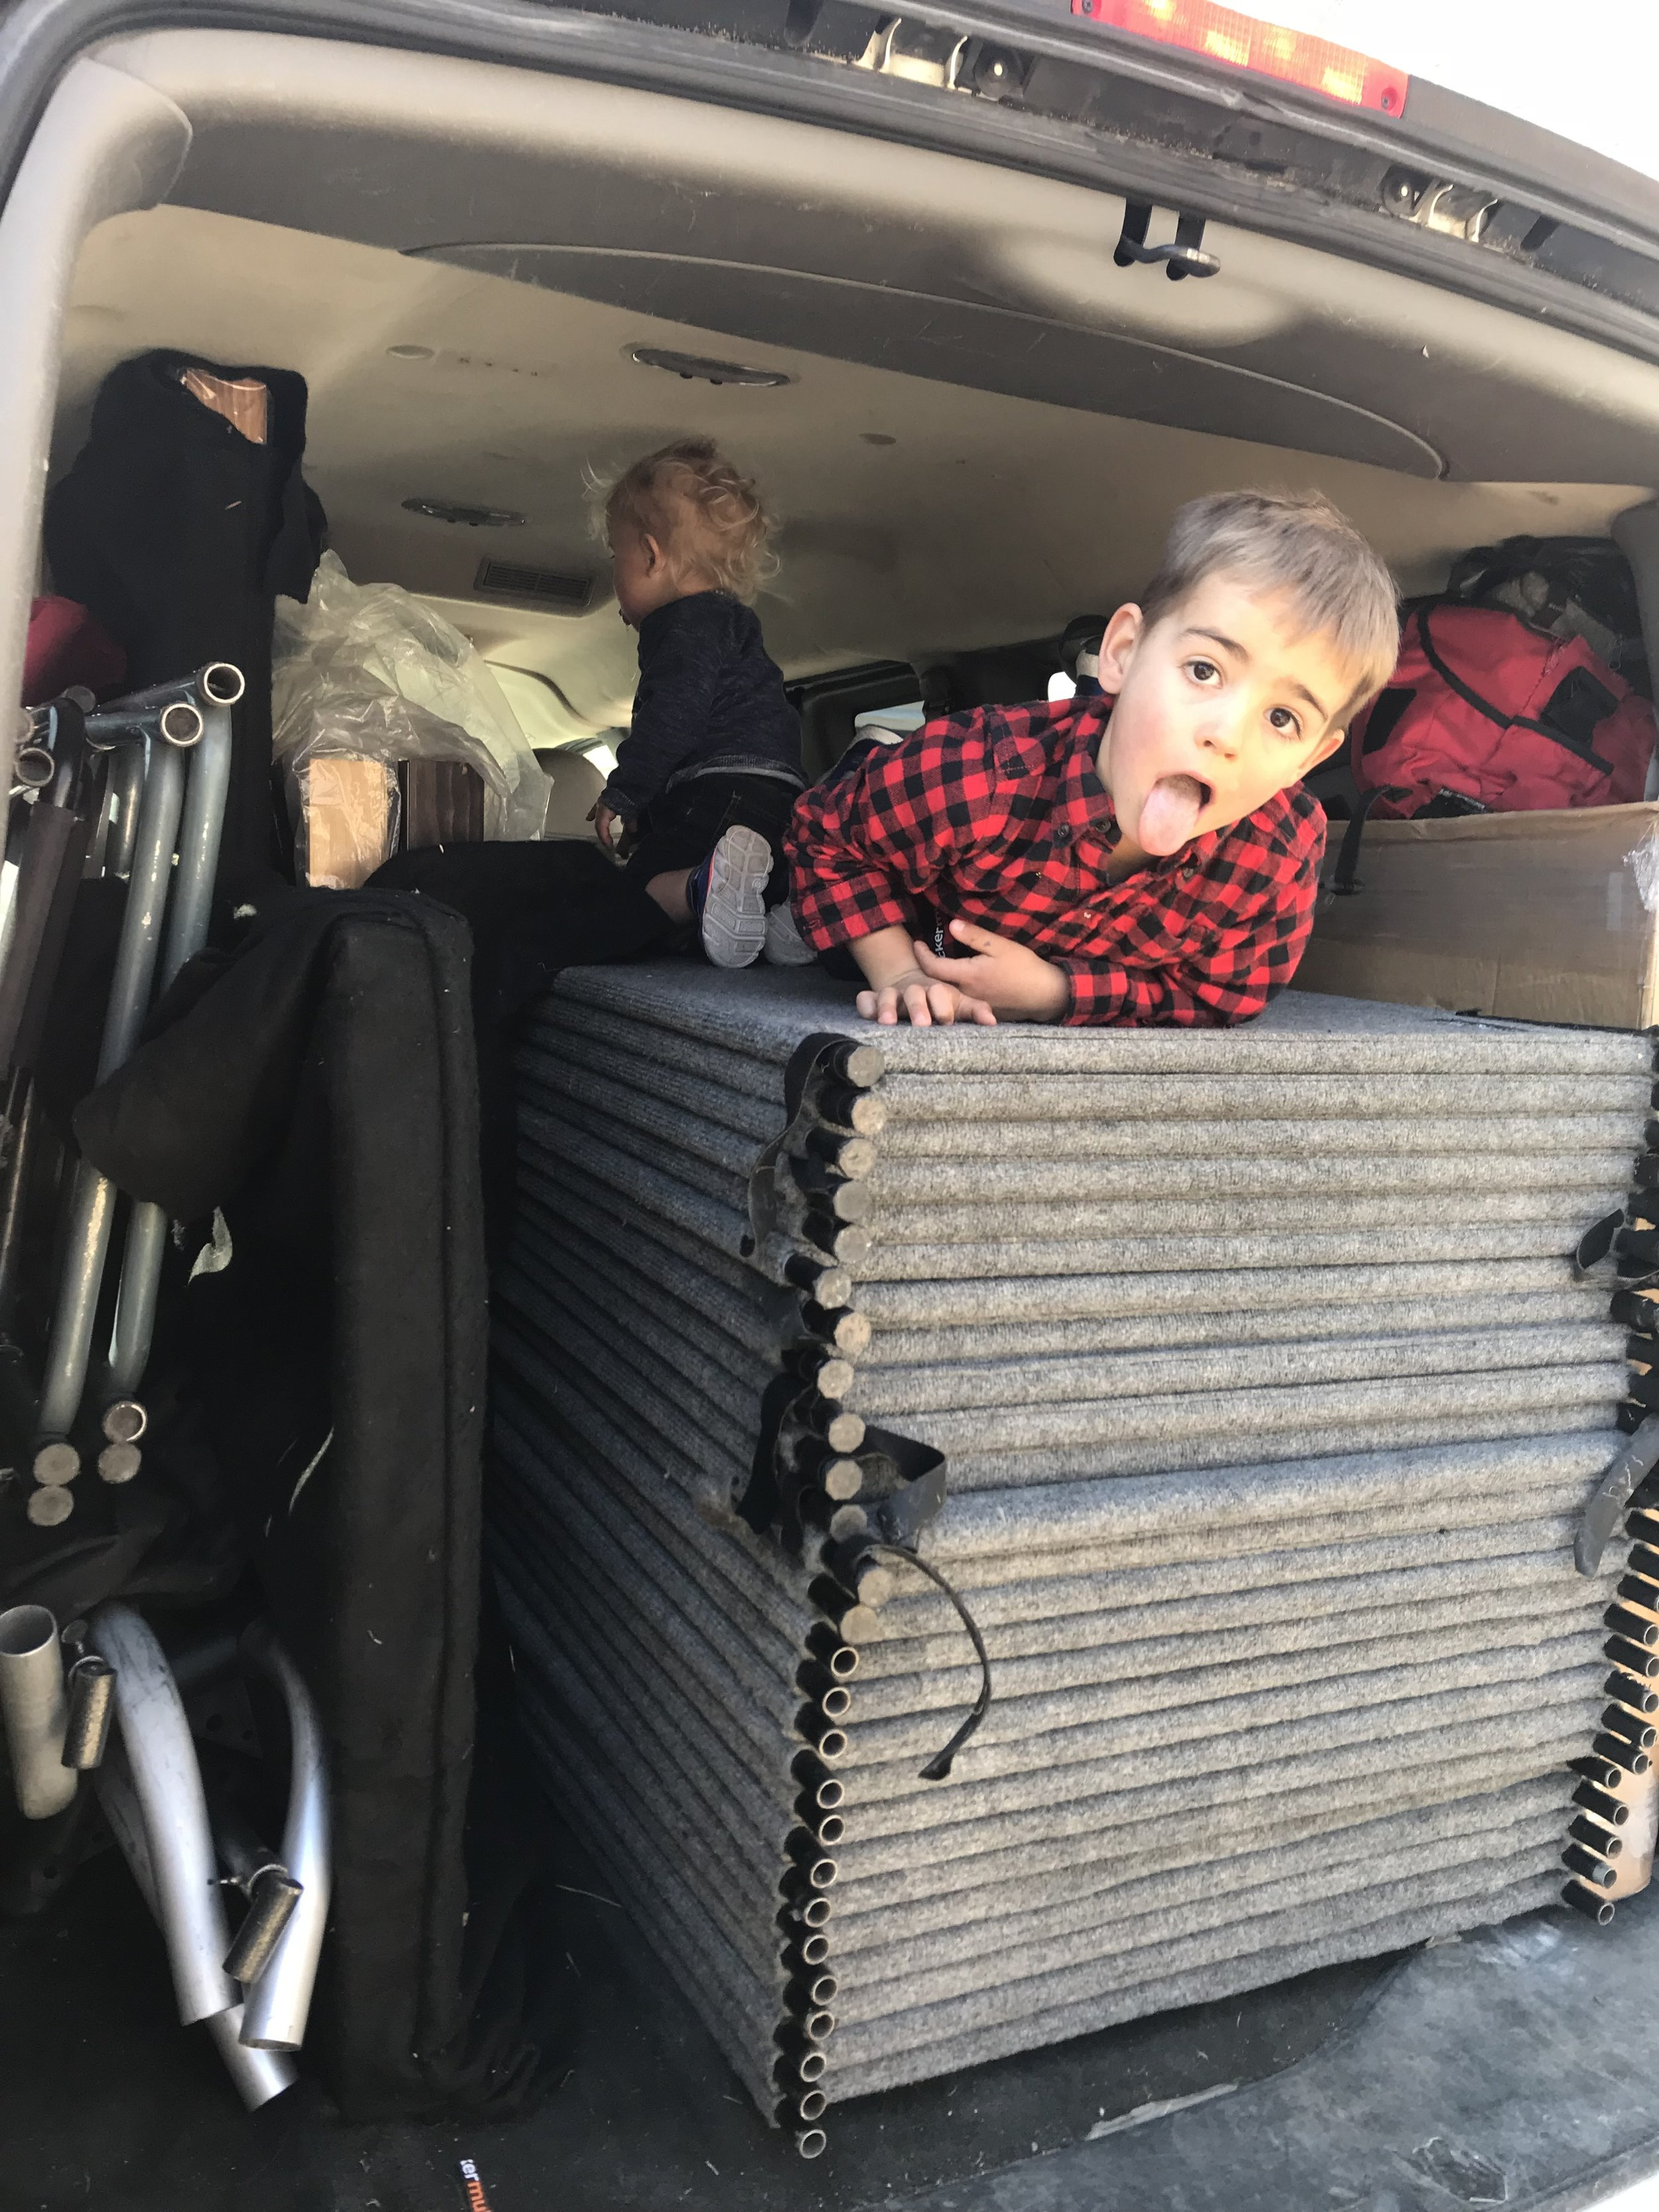 Van packing   Glenn, MI   March